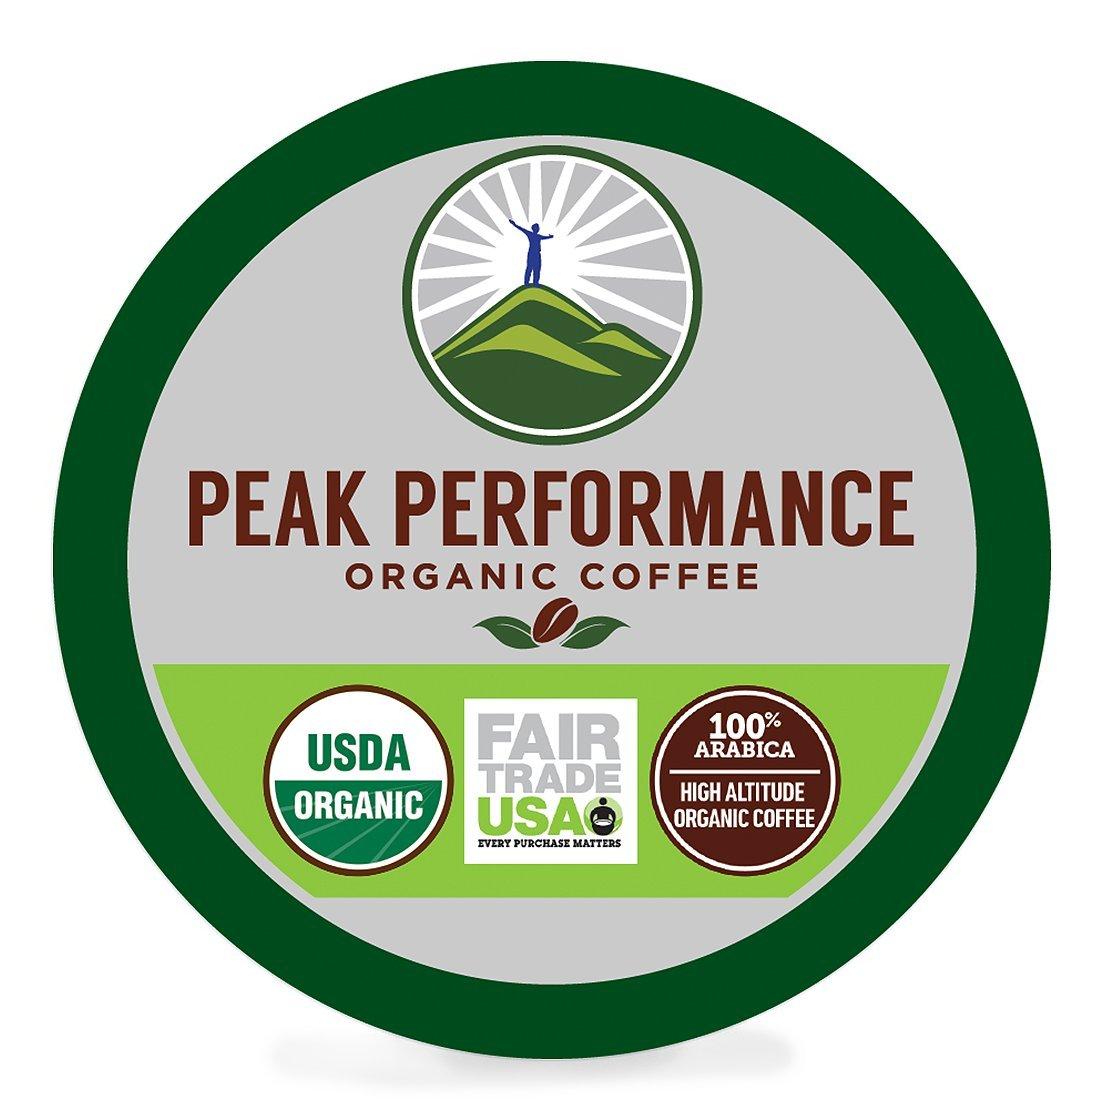 Peak Performance High Altitude Organic Coffee. High Performance Body & Mind Coffee For High Performance Individuals. Fair Trade Beans Full Of Antioxidants. Medium Roast Single Serve KCups 96 Count by Peak Performance Coffee